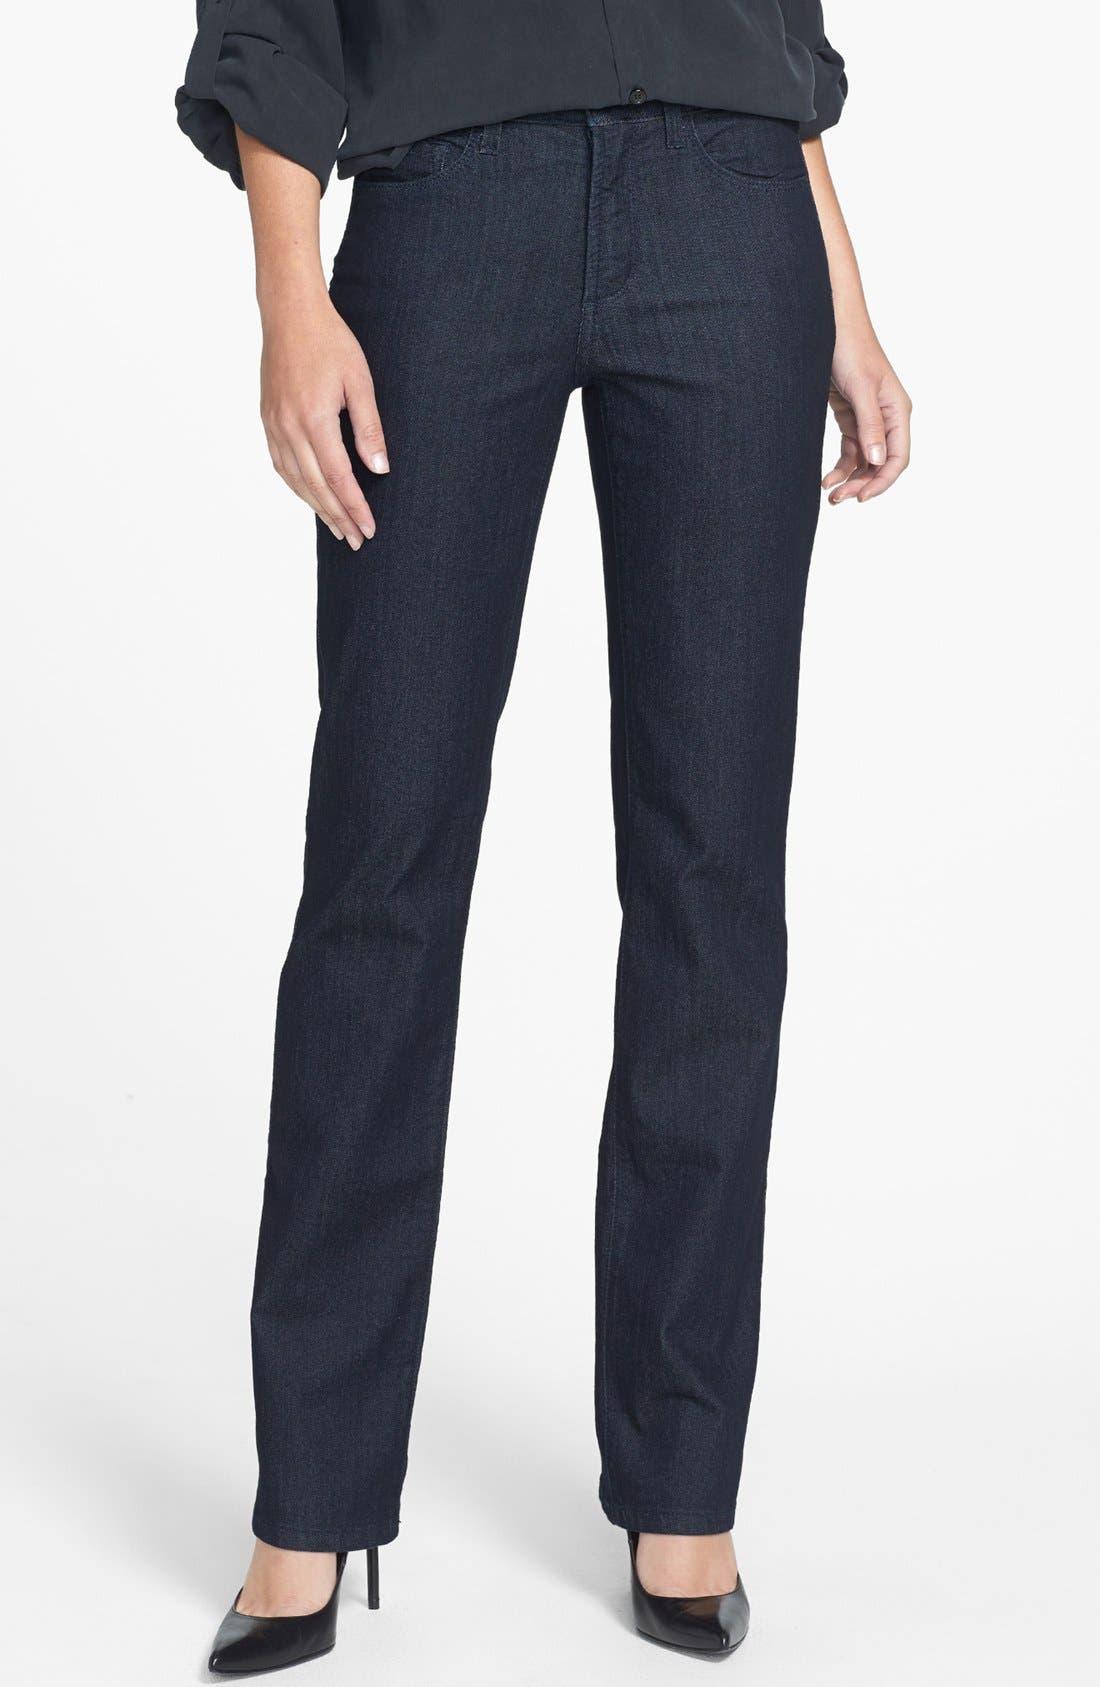 Main Image - NYDJ 'Marilyn' Embellished Pocket Stretch Straight Leg Jeans